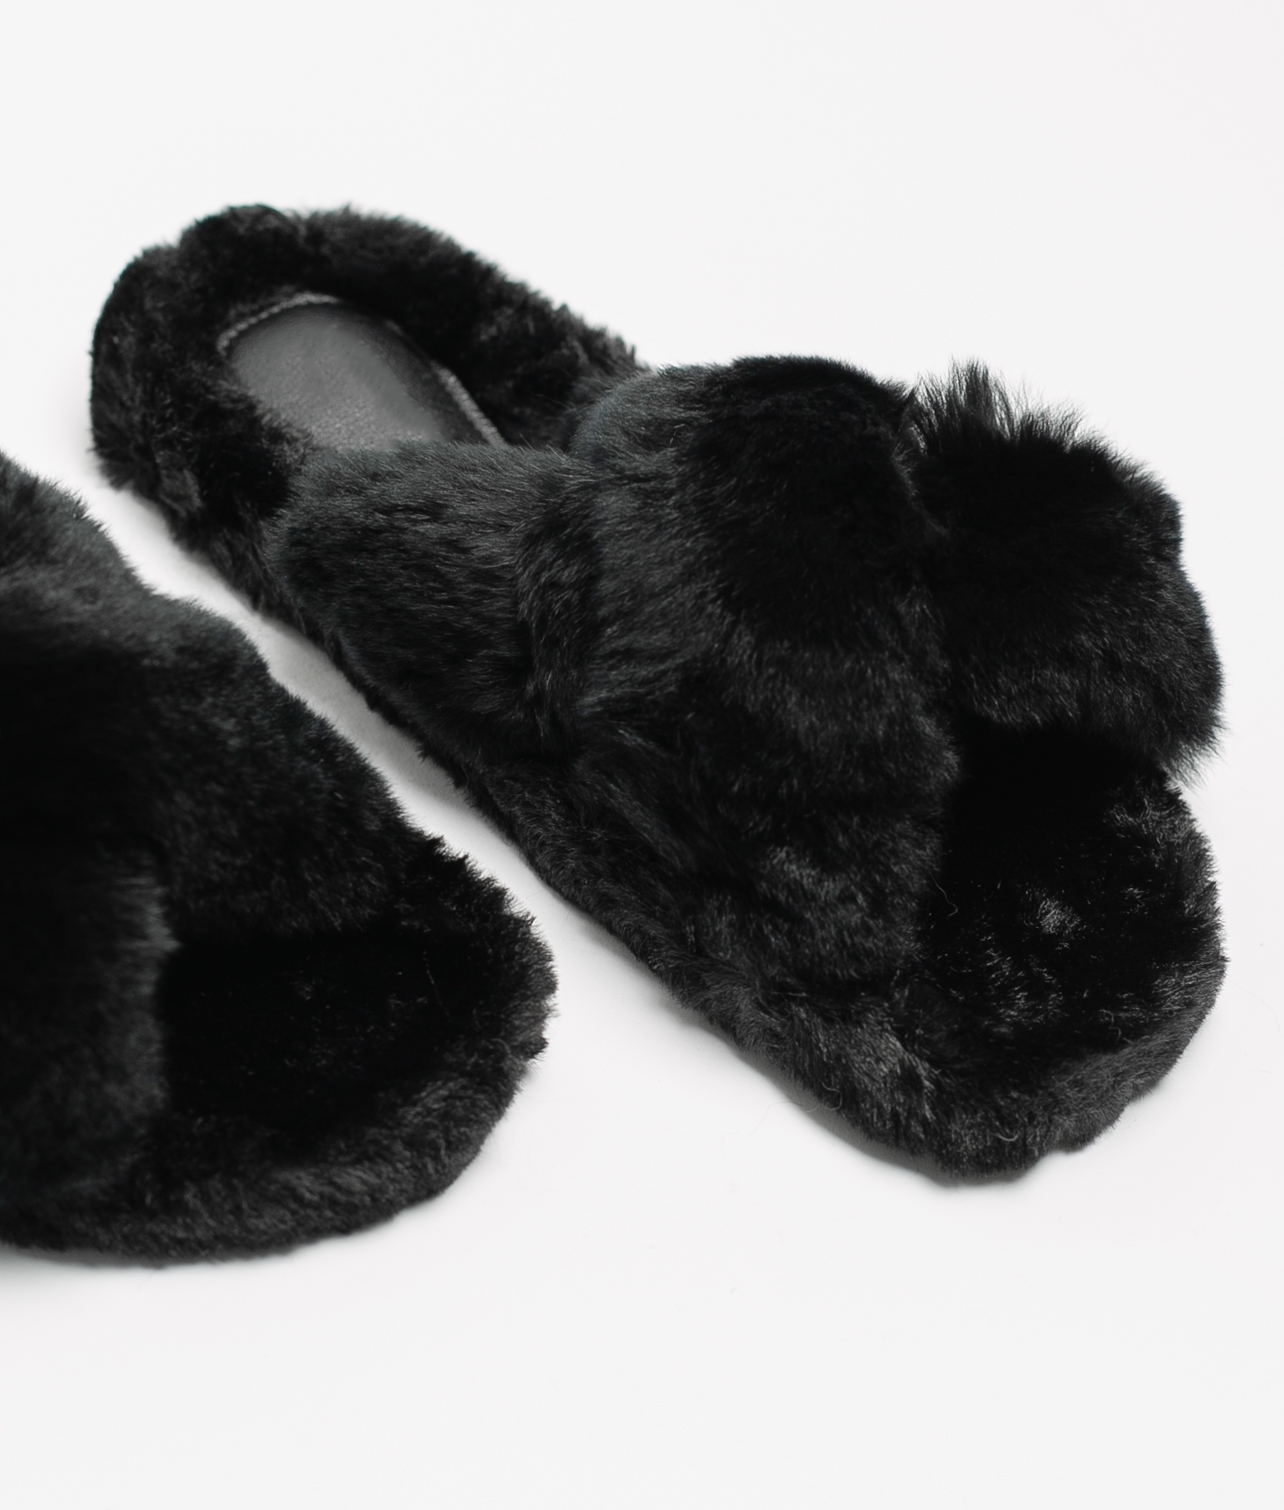 BUNY SLIPPERS - BLACK